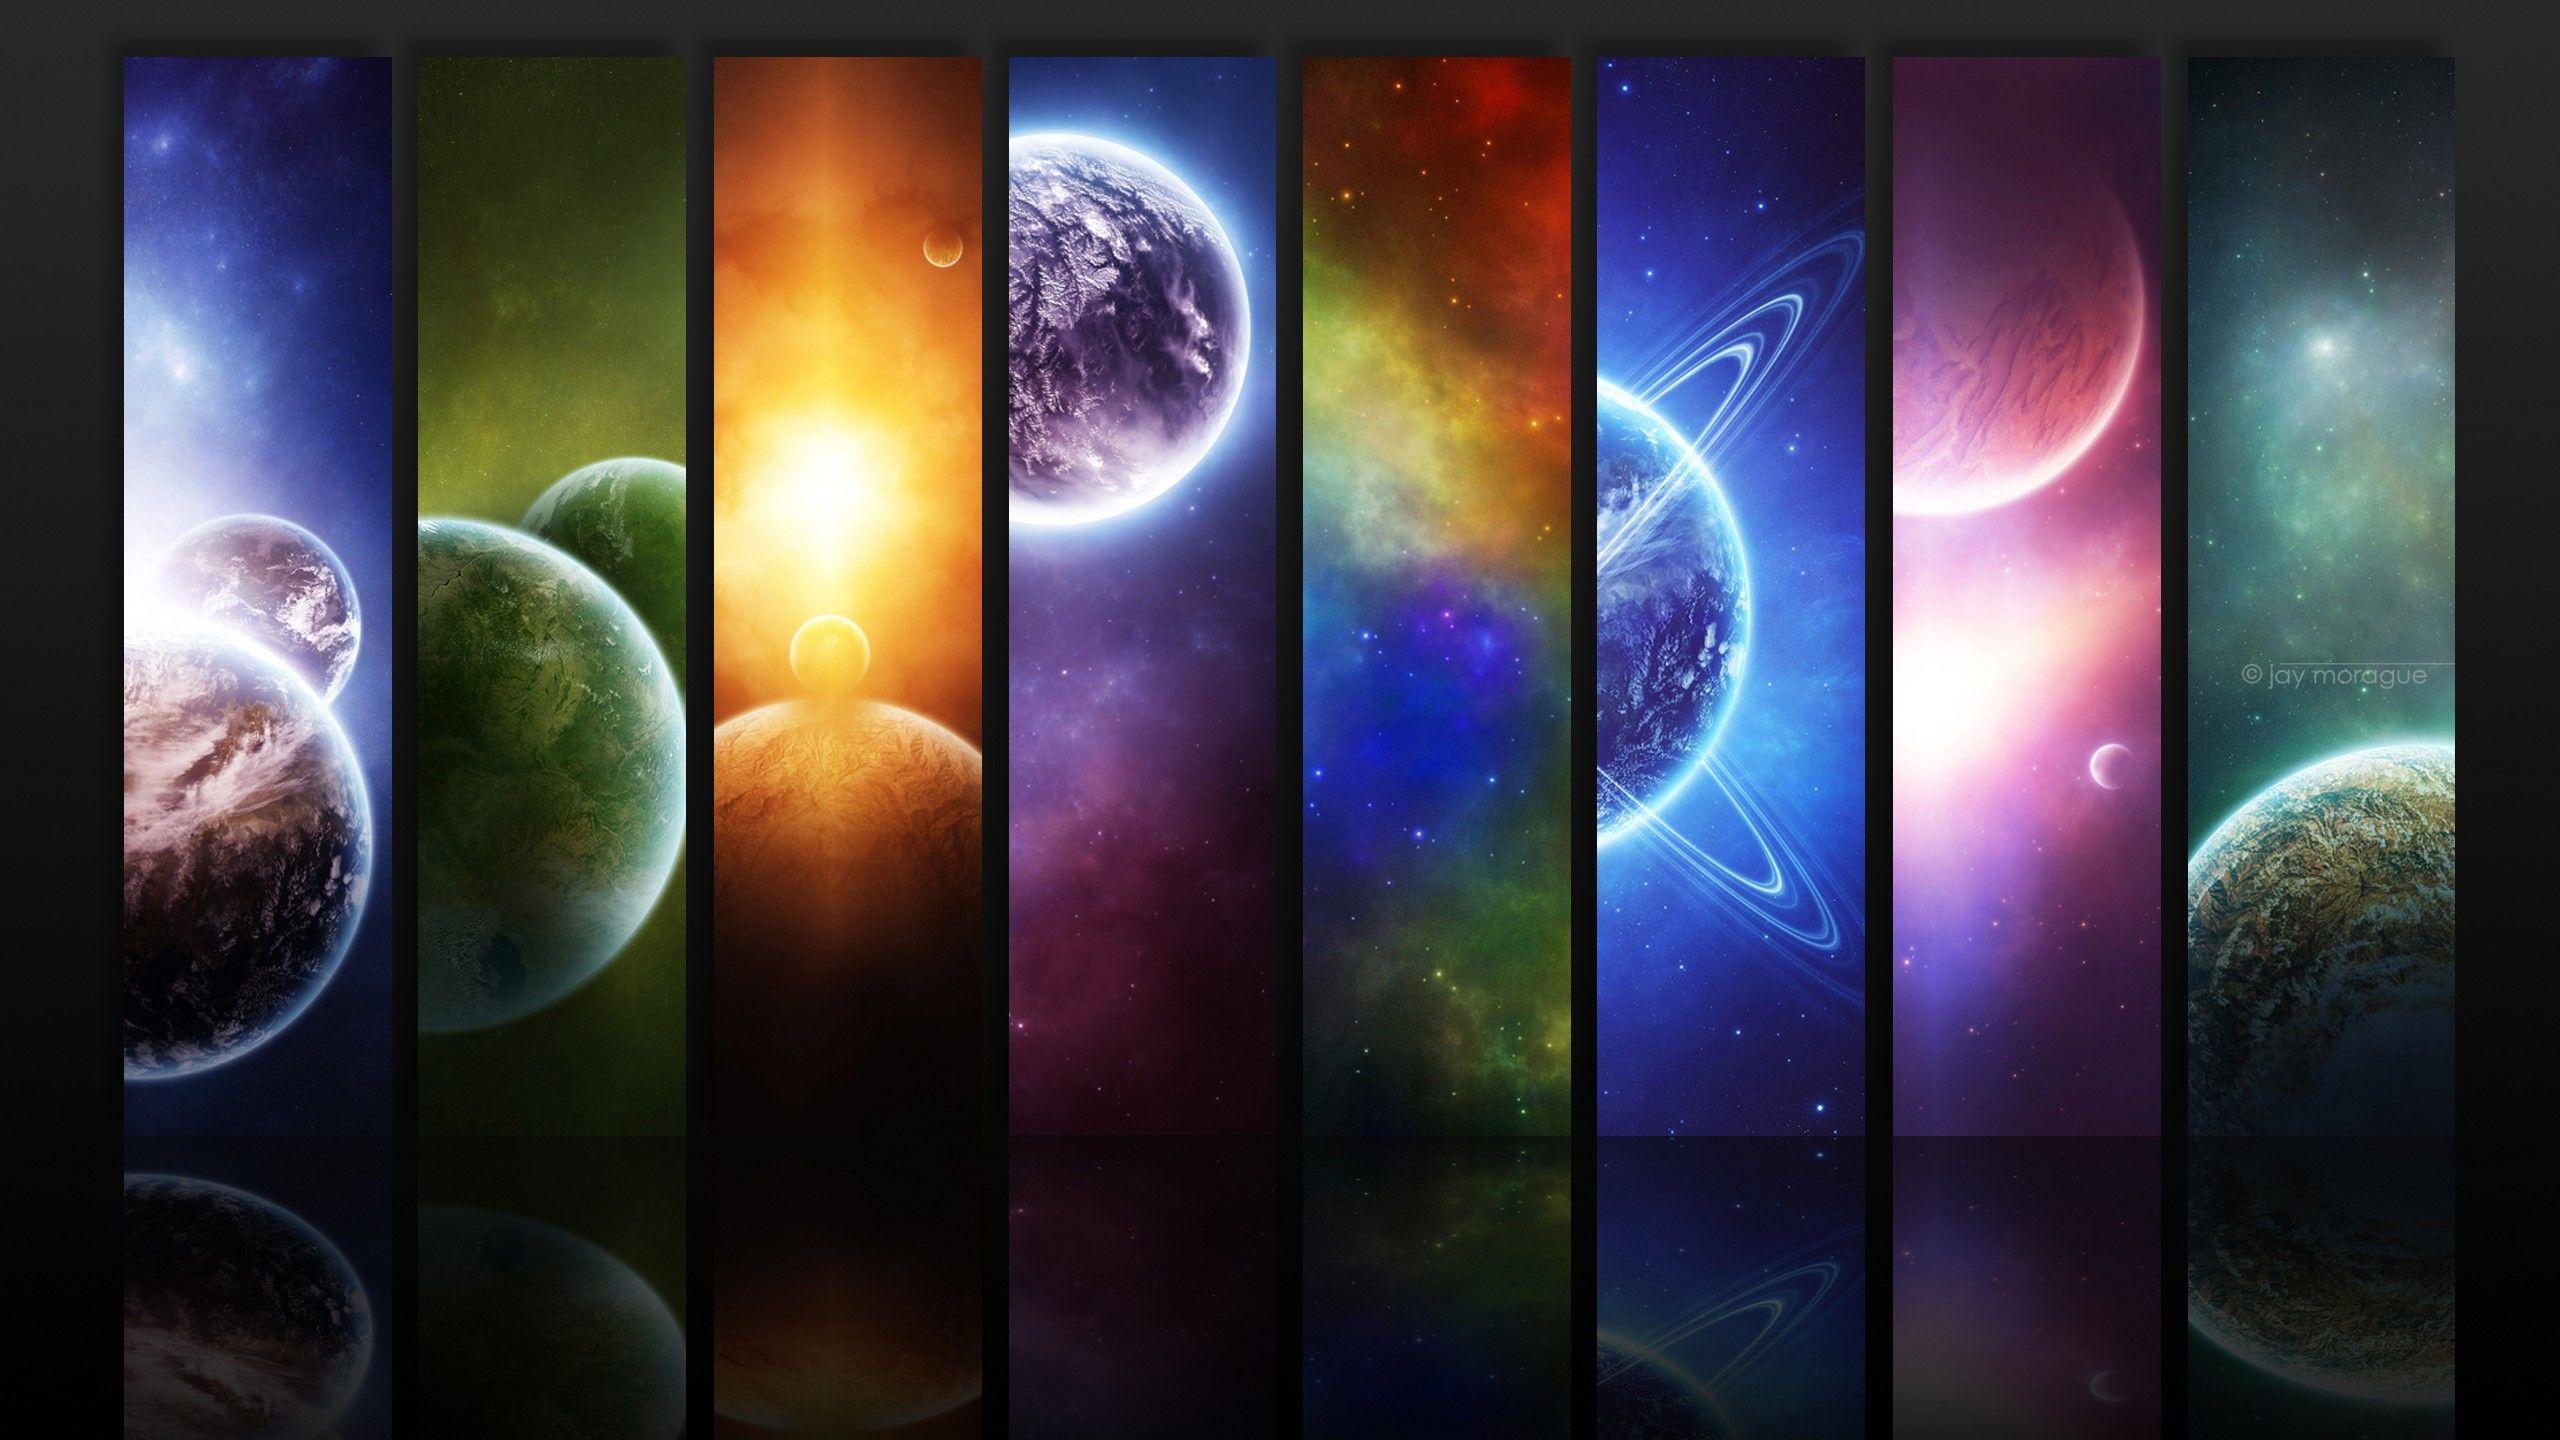 2560 X 1440 Wallpaper Pesquisa Google Peinture Galaxie